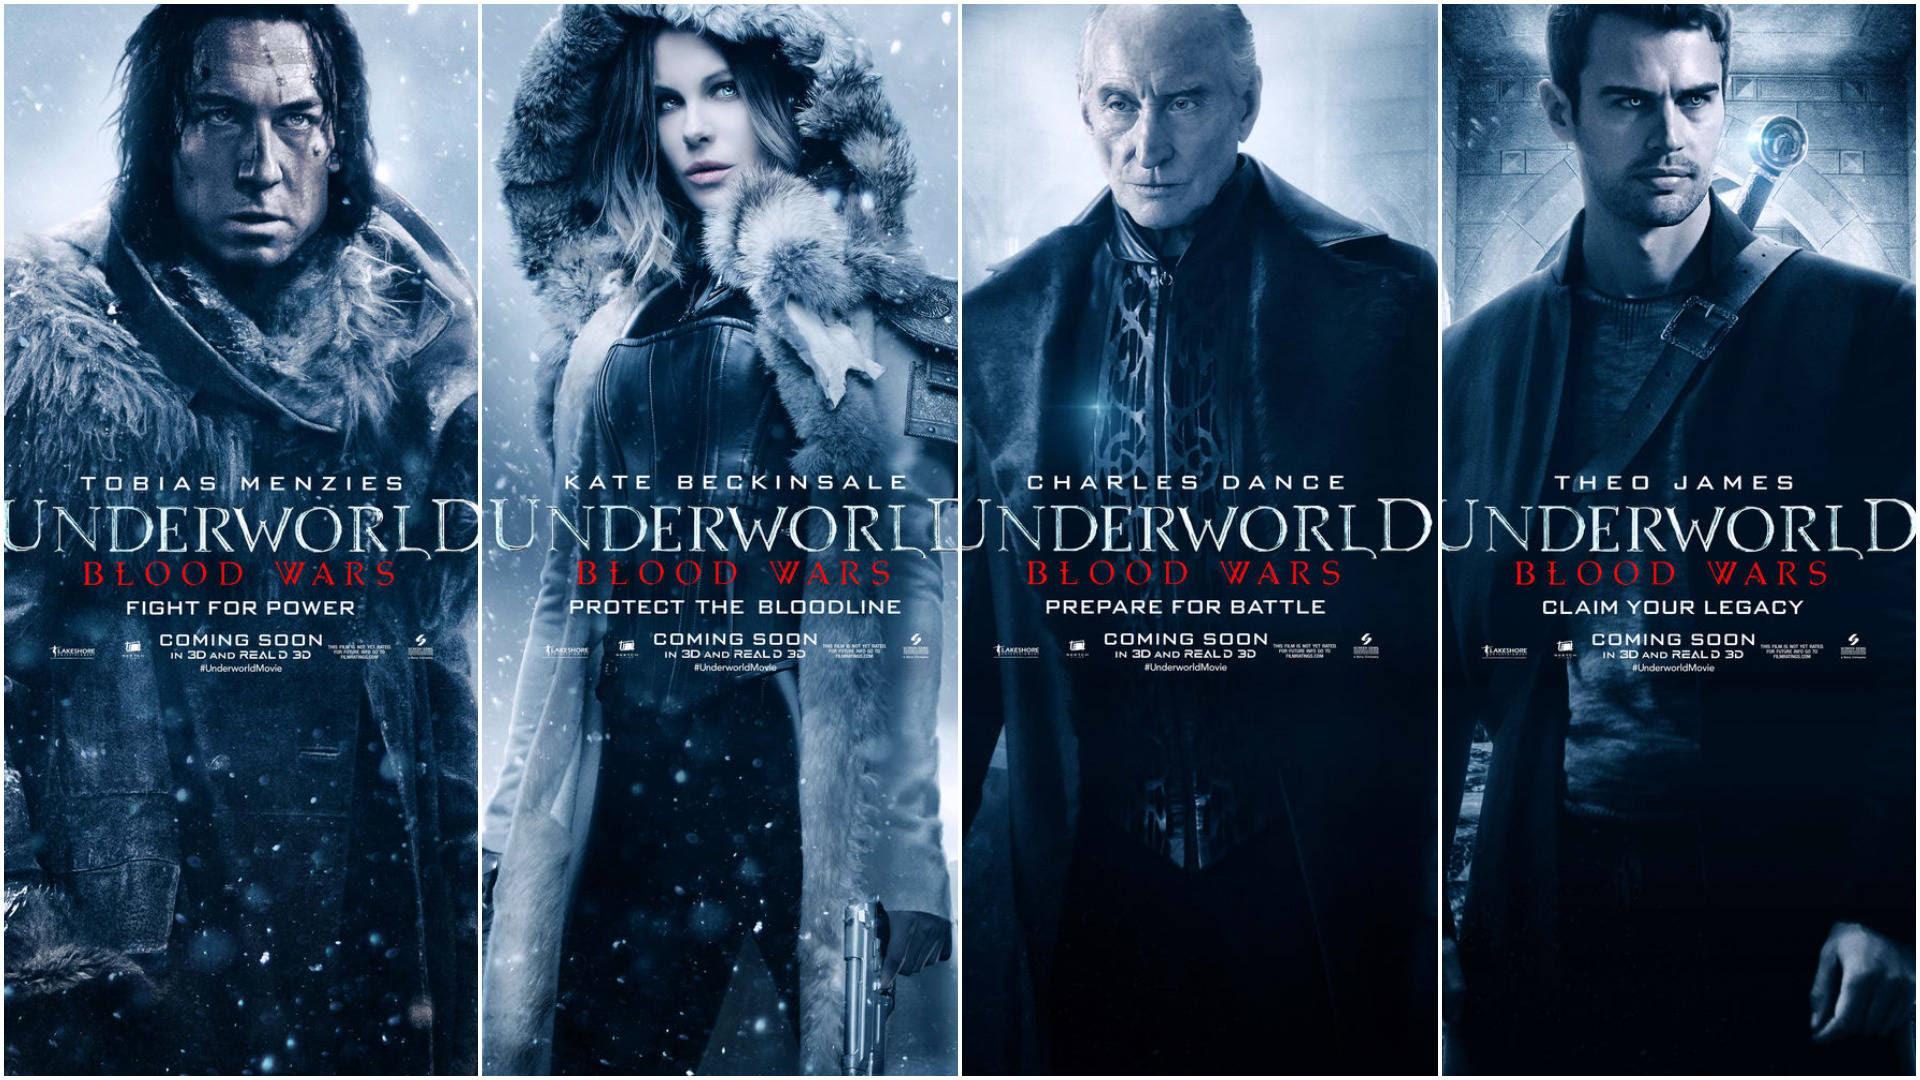 Resultado de imagem para underworld  blood wars posters